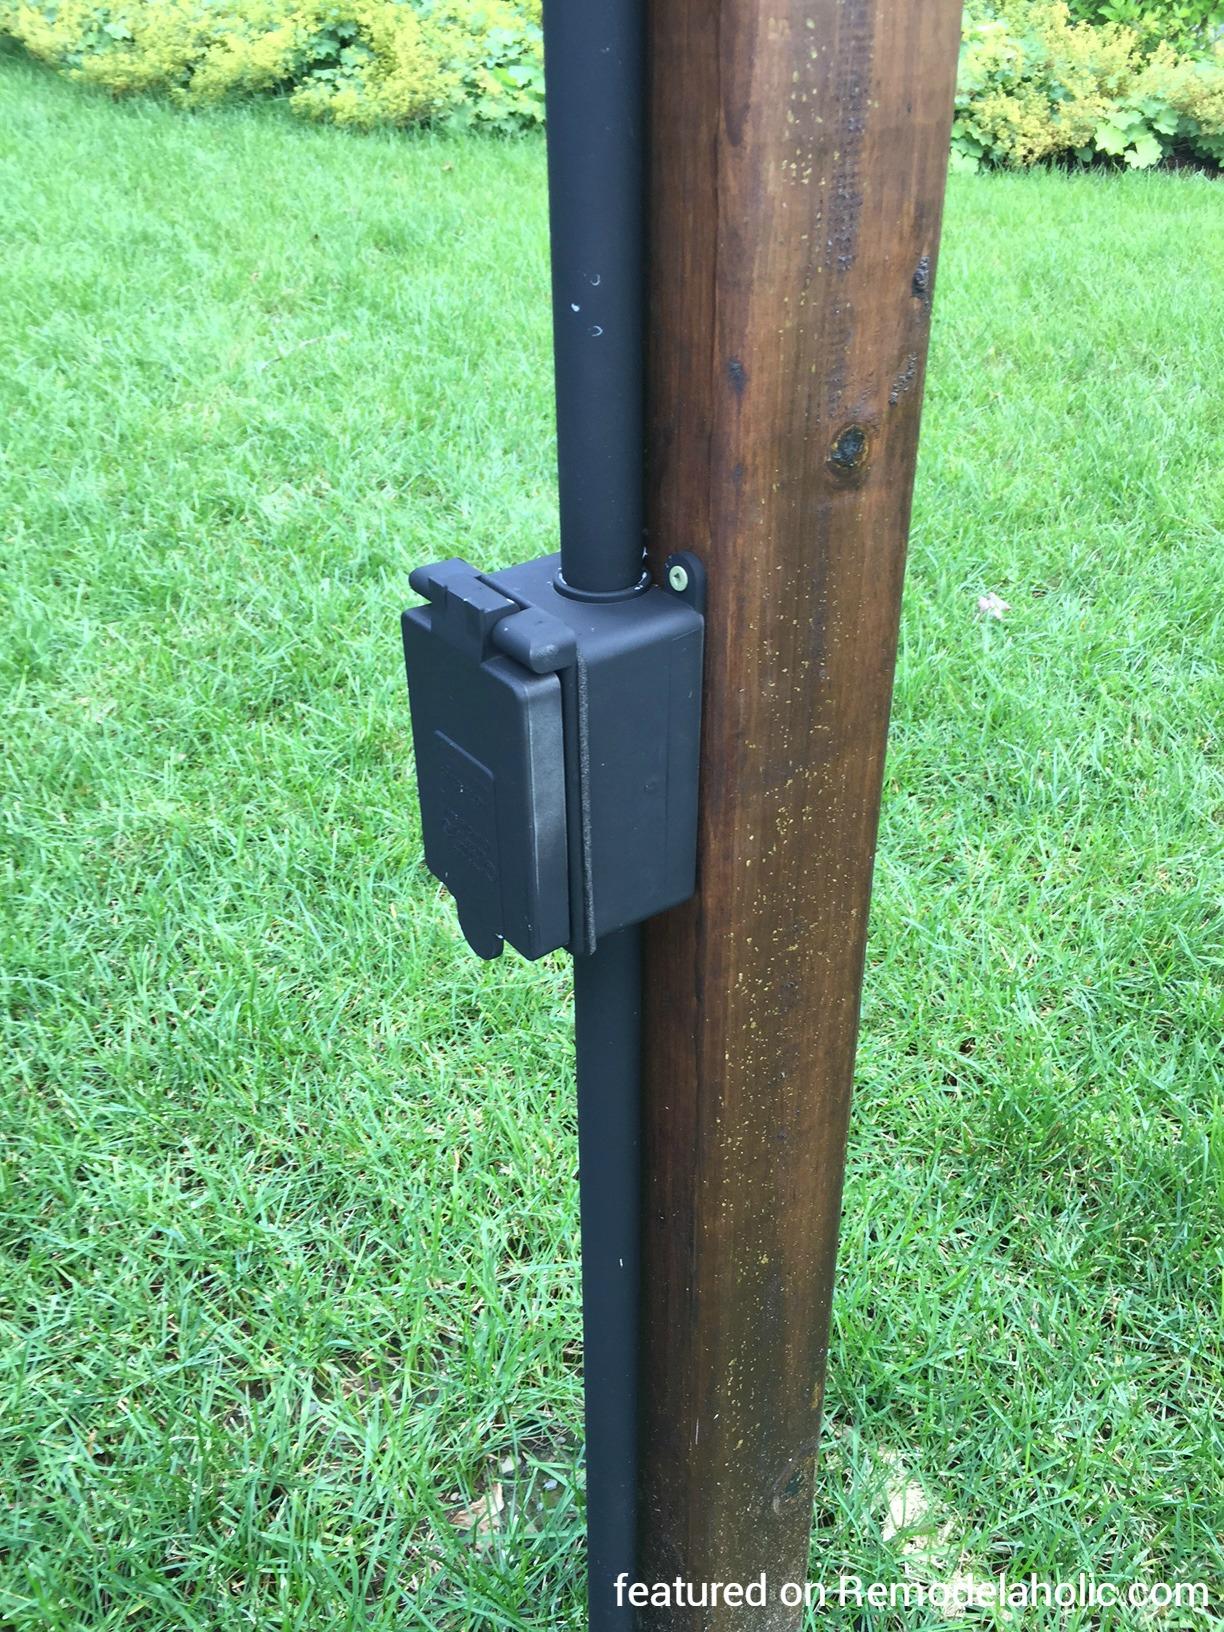 How to install an outdoor light post outdoor lighting diy solar light post ideas aloadofball Choice Image